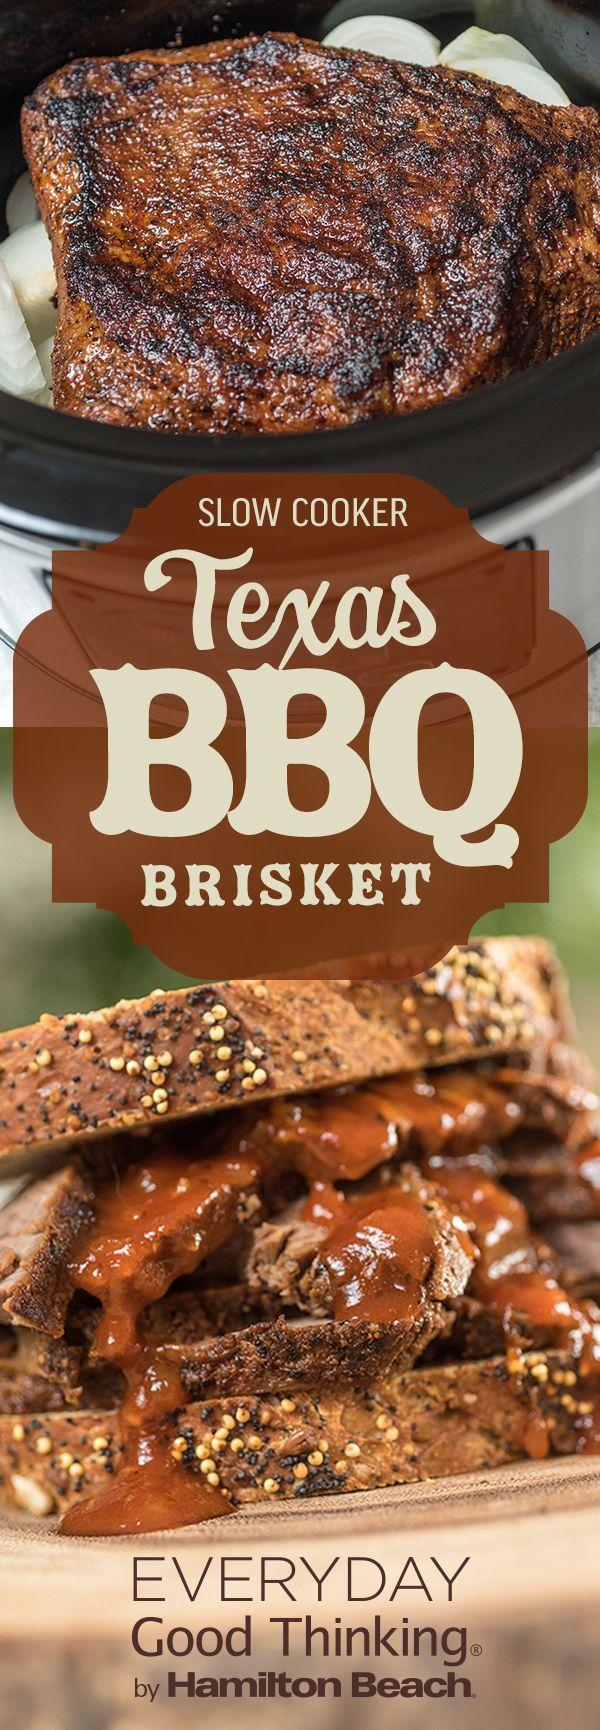 Slow Cooker Texas BBQ Brisket